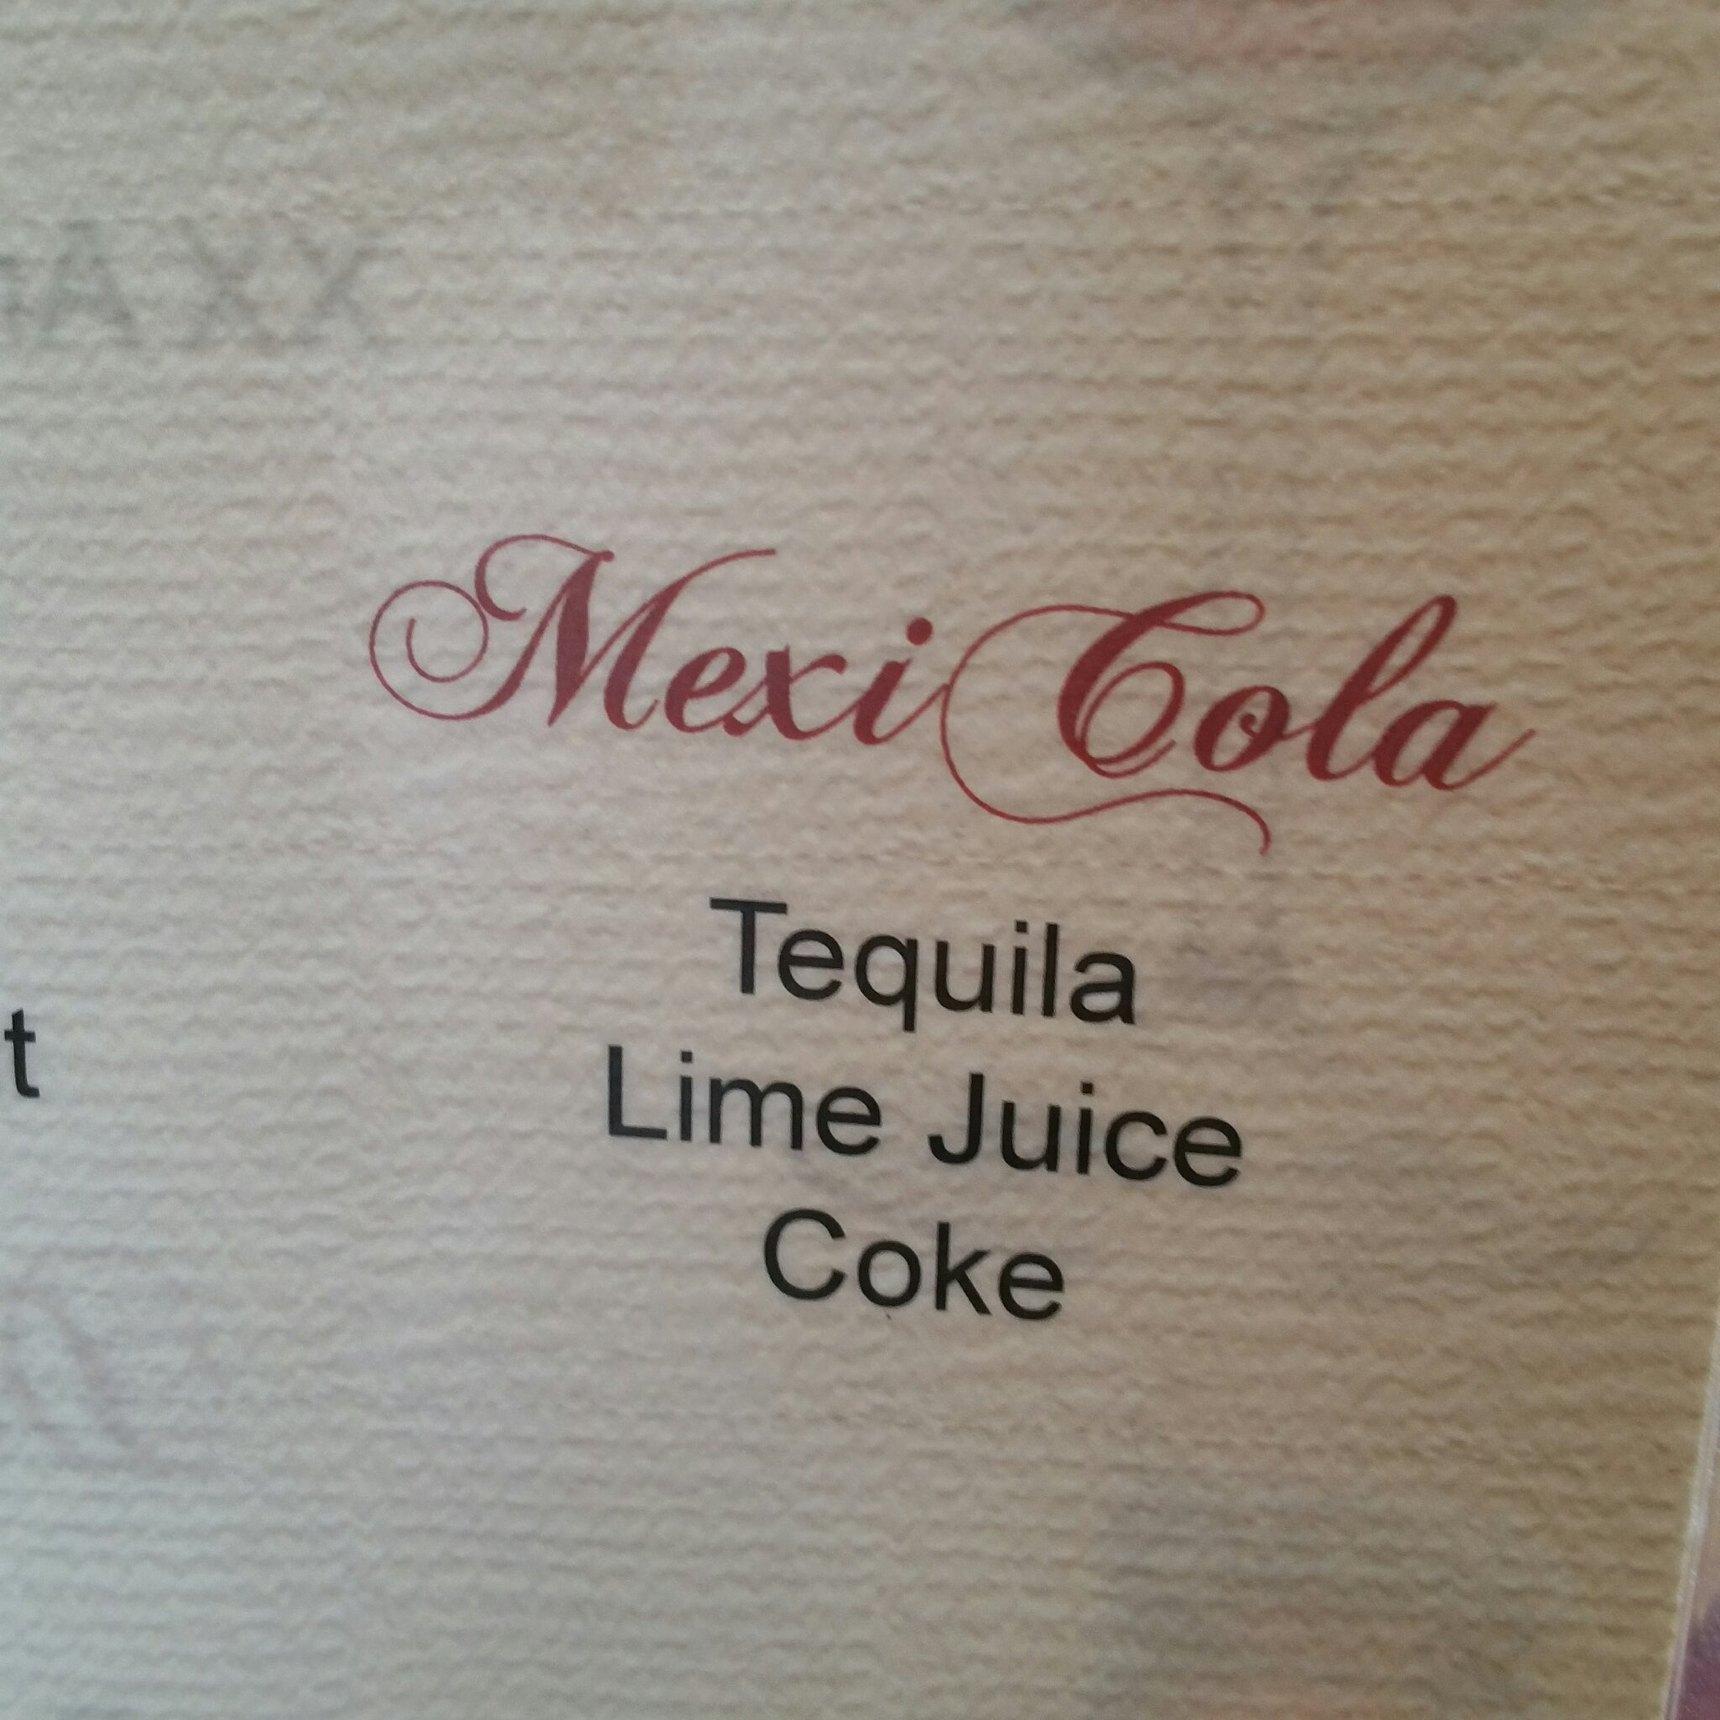 Mexican soda - meme